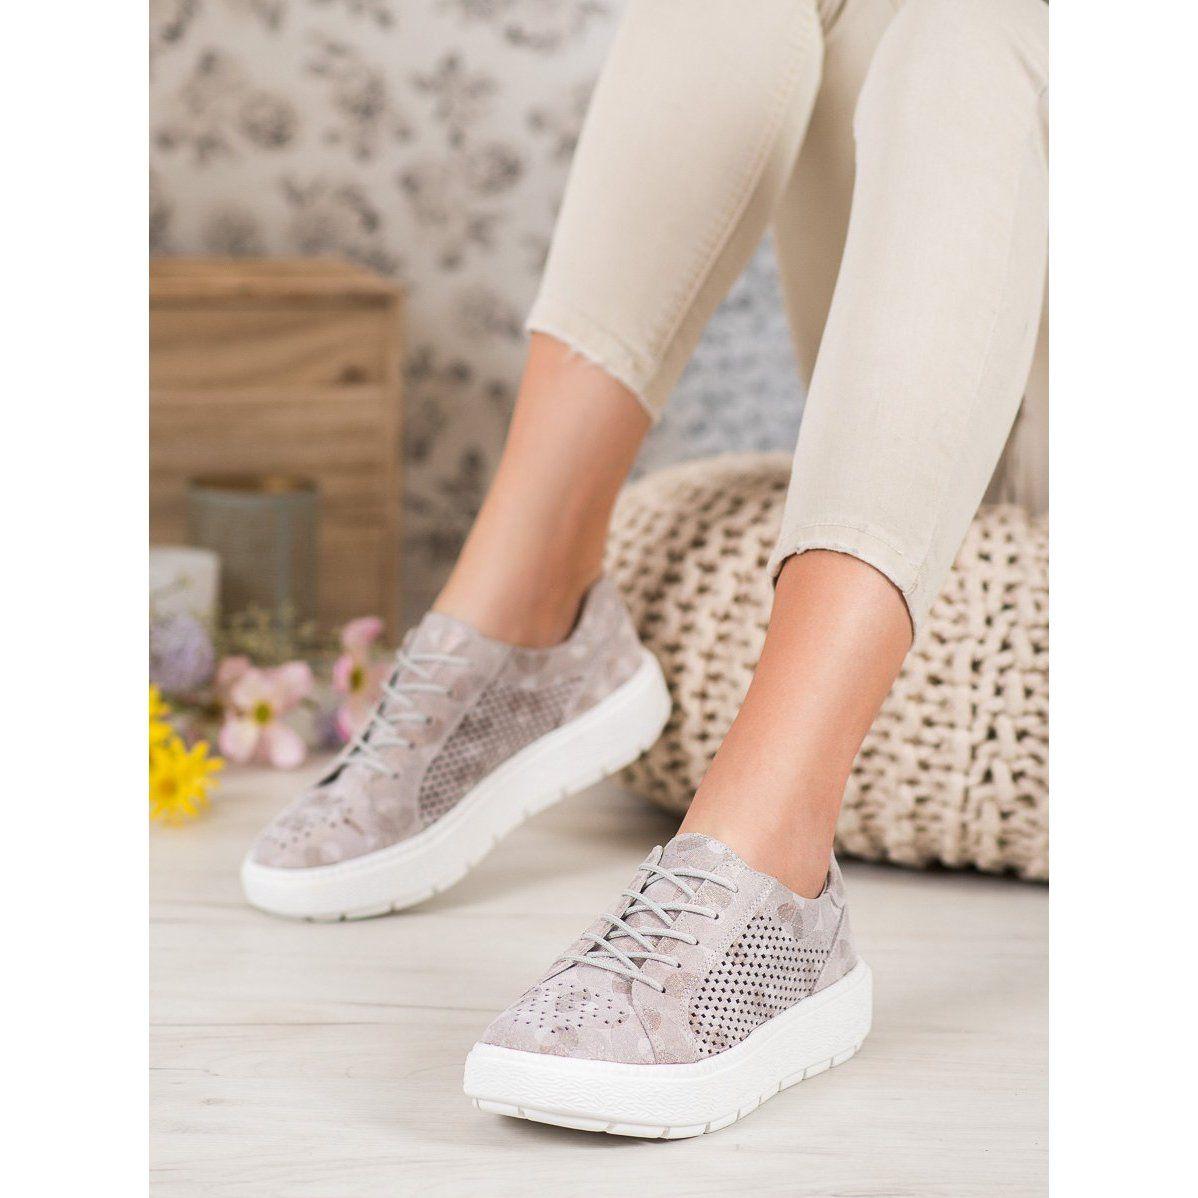 Goodin Sznurowane Polbuty Brazowe Wedding Sneaker Adidas Sneakers Shoes